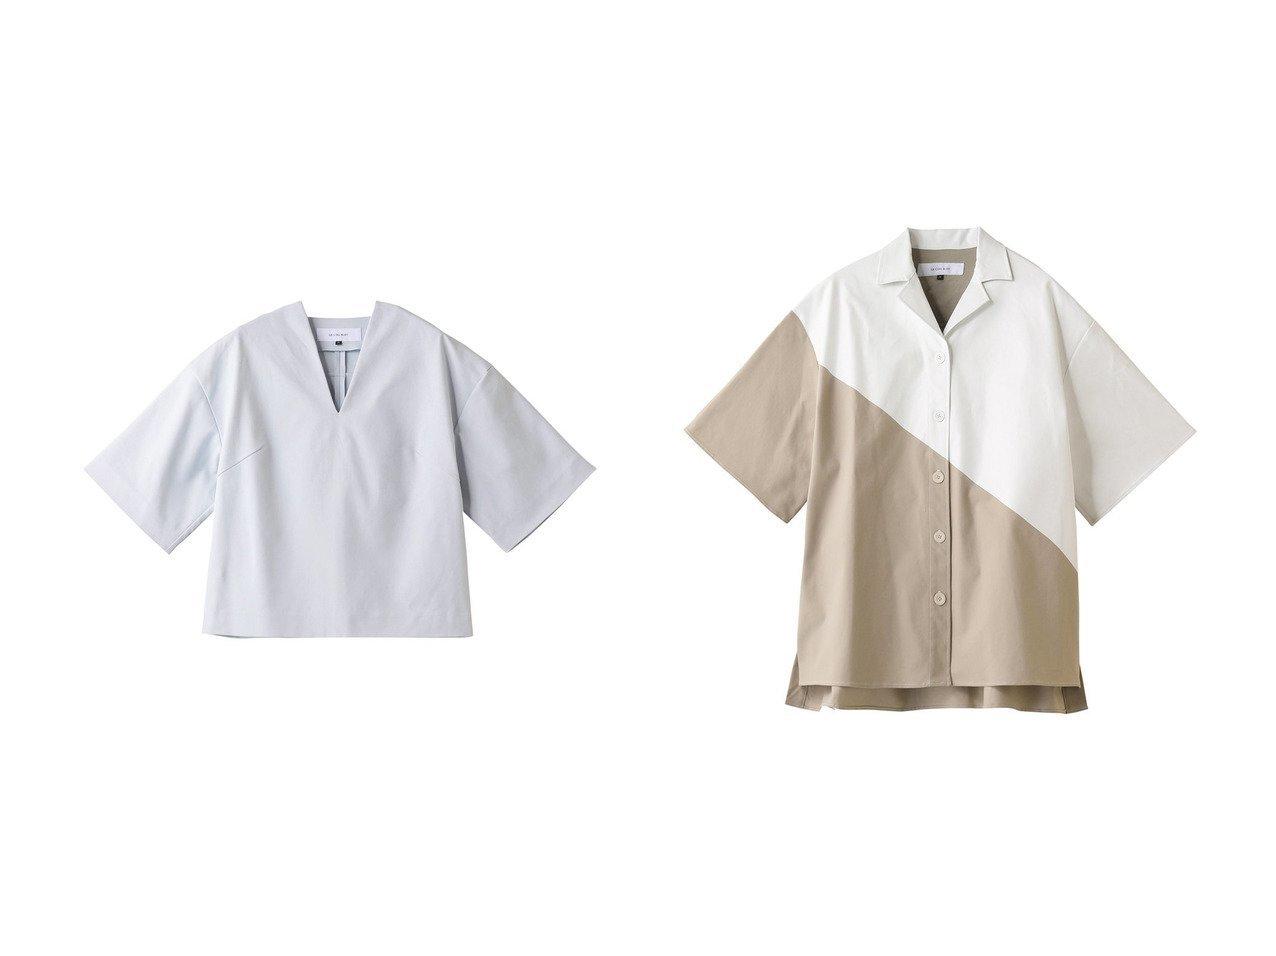 【LE CIEL BLEU/ルシェル ブルー】のフォームドVネックシャツ&ホワイトプリンテッドシャツ 【トップス・カットソー】おすすめ!人気、トレンド・レディースファッションの通販  おすすめで人気の流行・トレンド、ファッションの通販商品 メンズファッション・キッズファッション・インテリア・家具・レディースファッション・服の通販 founy(ファニー) https://founy.com/ ファッション Fashion レディースファッション WOMEN トップス・カットソー Tops/Tshirt シャツ/ブラウス Shirts/Blouses Vネック V-Neck おすすめ Recommend ショート シンプル スタイリッシュ スリーブ デコルテ リラックス |ID:crp329100000034082